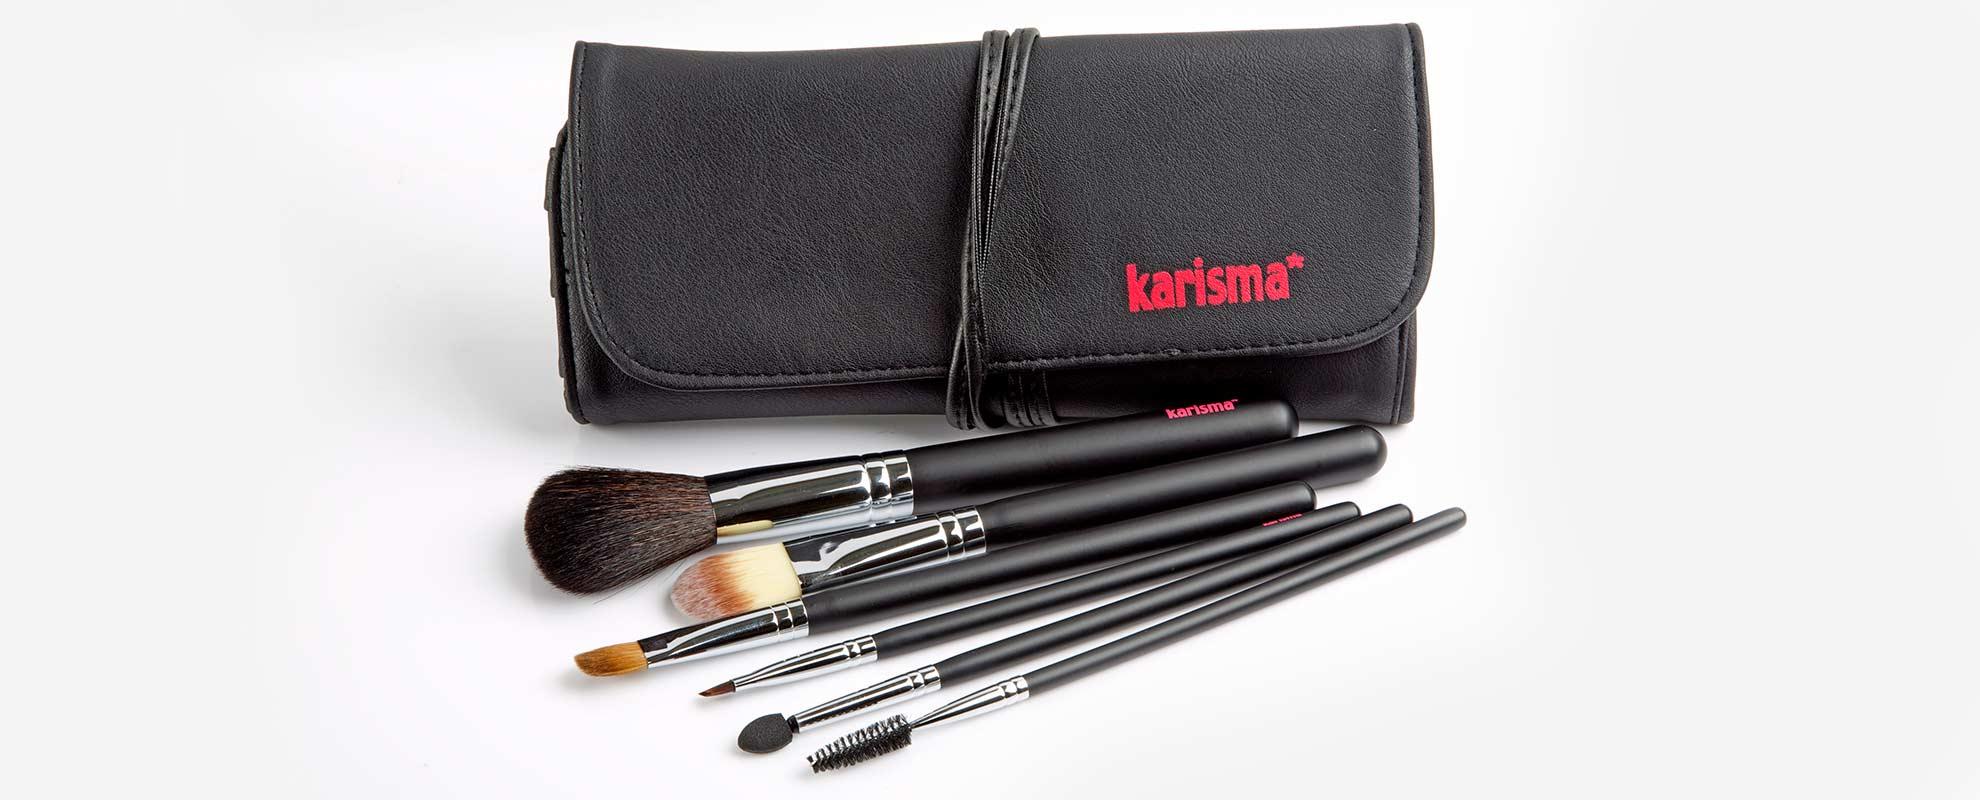 karisma_cosmetics1.jpg